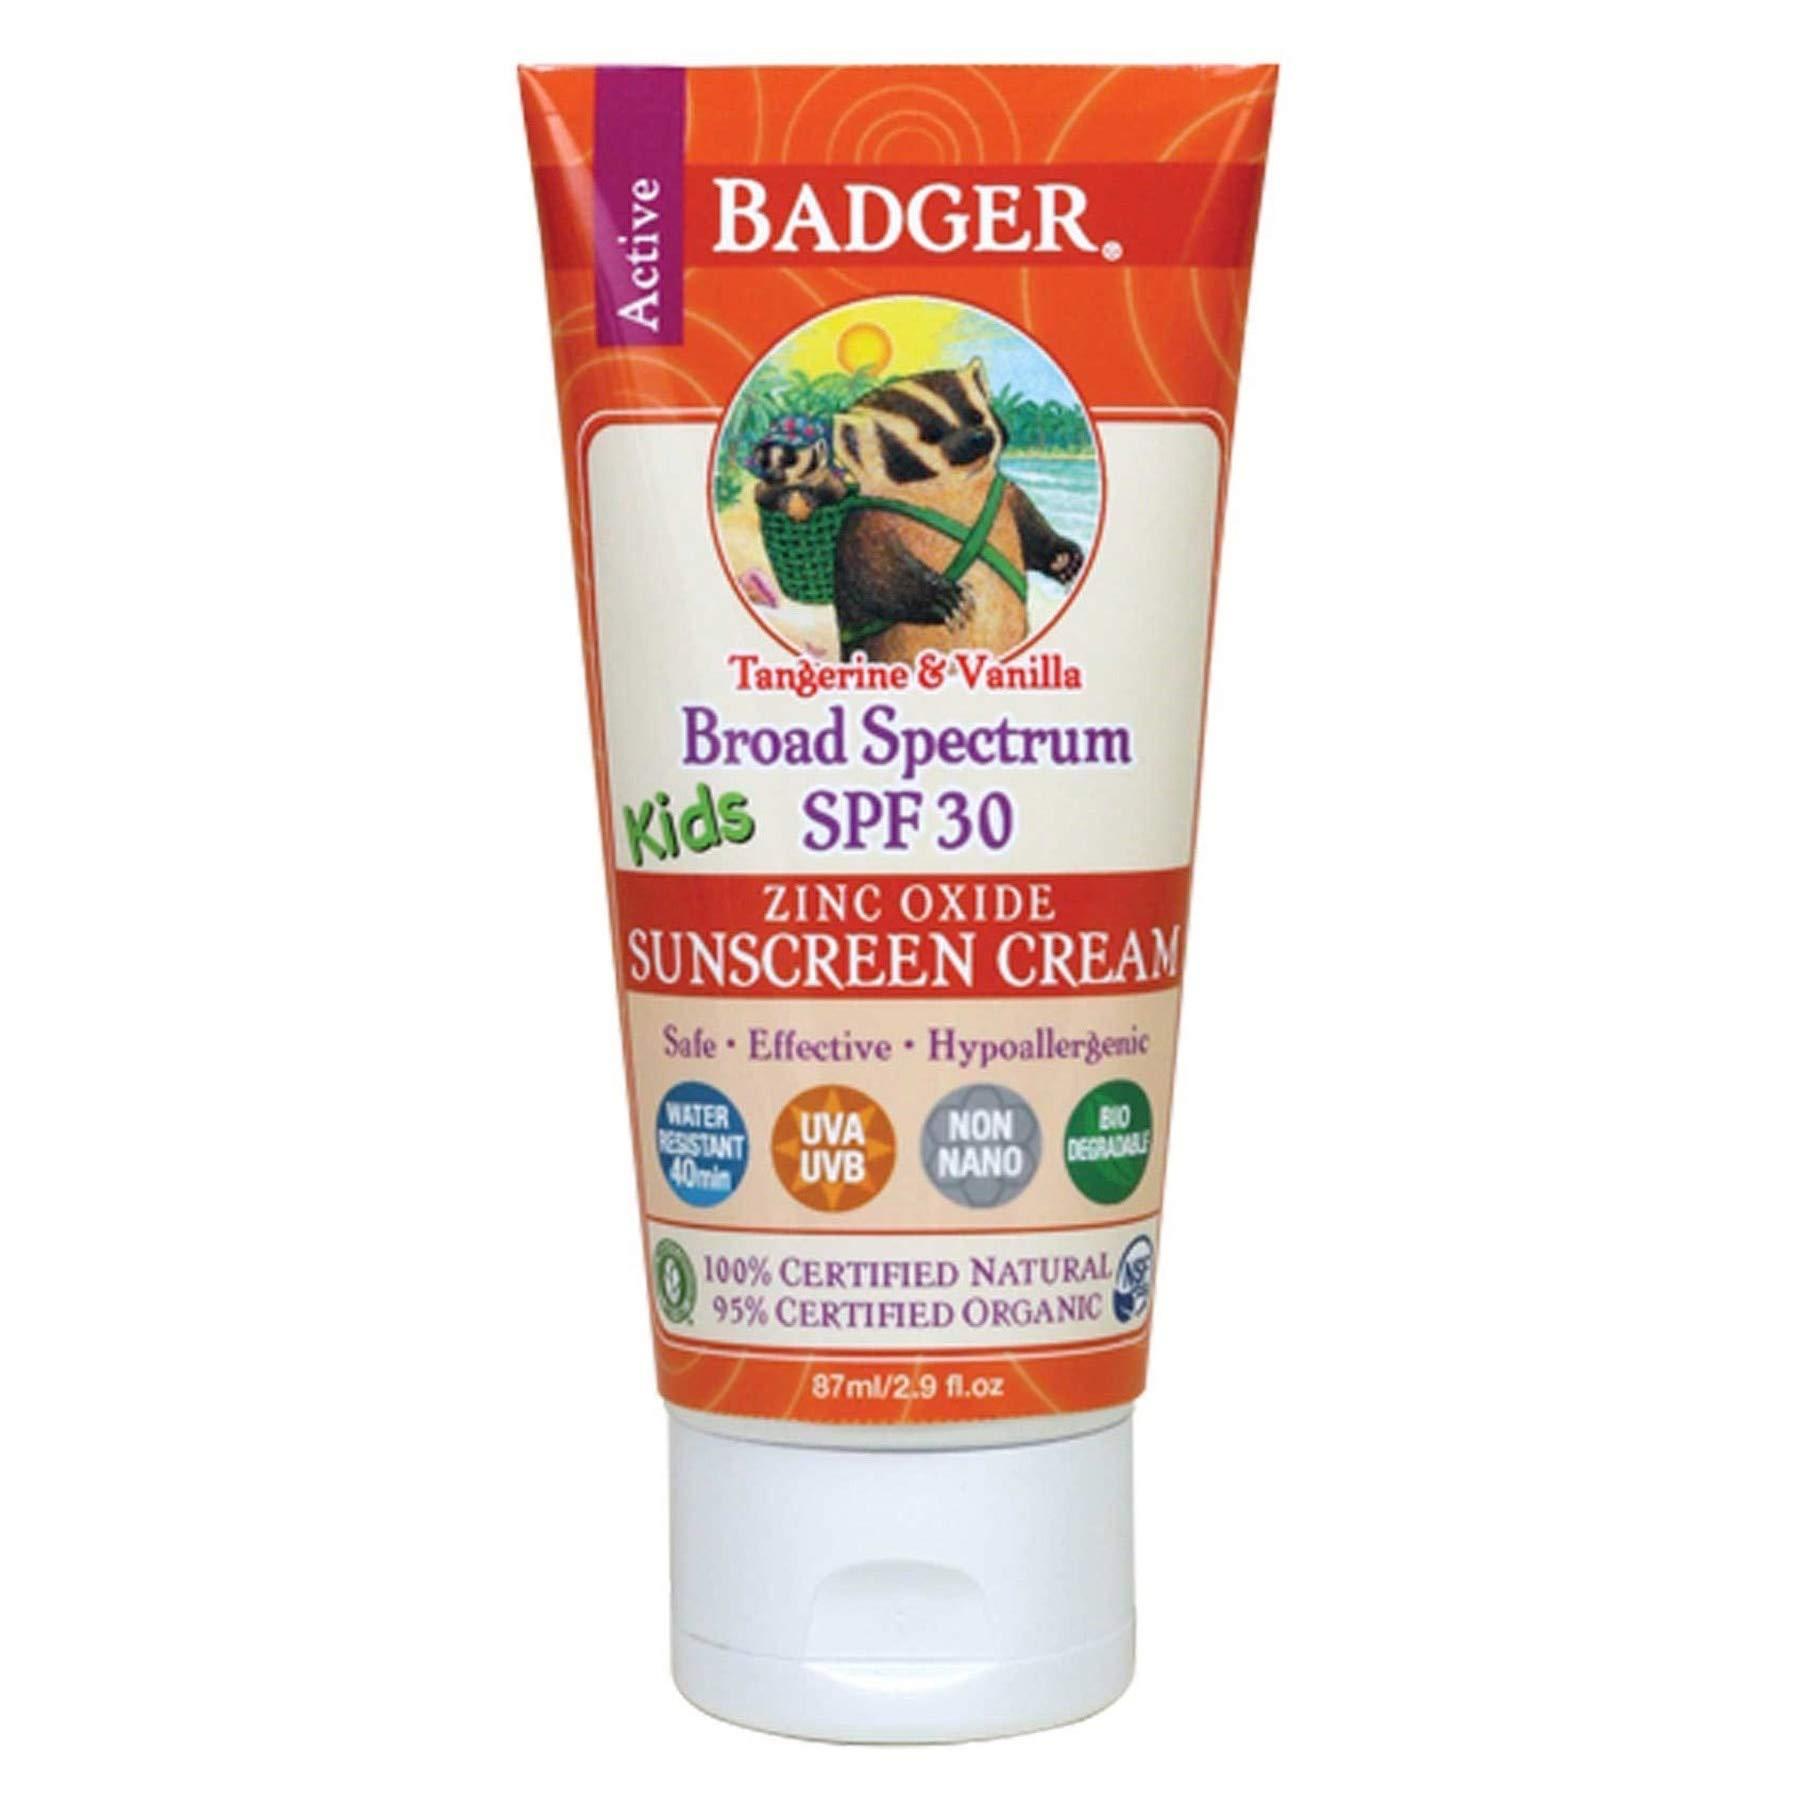 Badger Broad Spectrum SPF 30 Kids Sunscreen Tangerine & Vanilla 2.9oz (6-Pack) by Badger (Image #2)